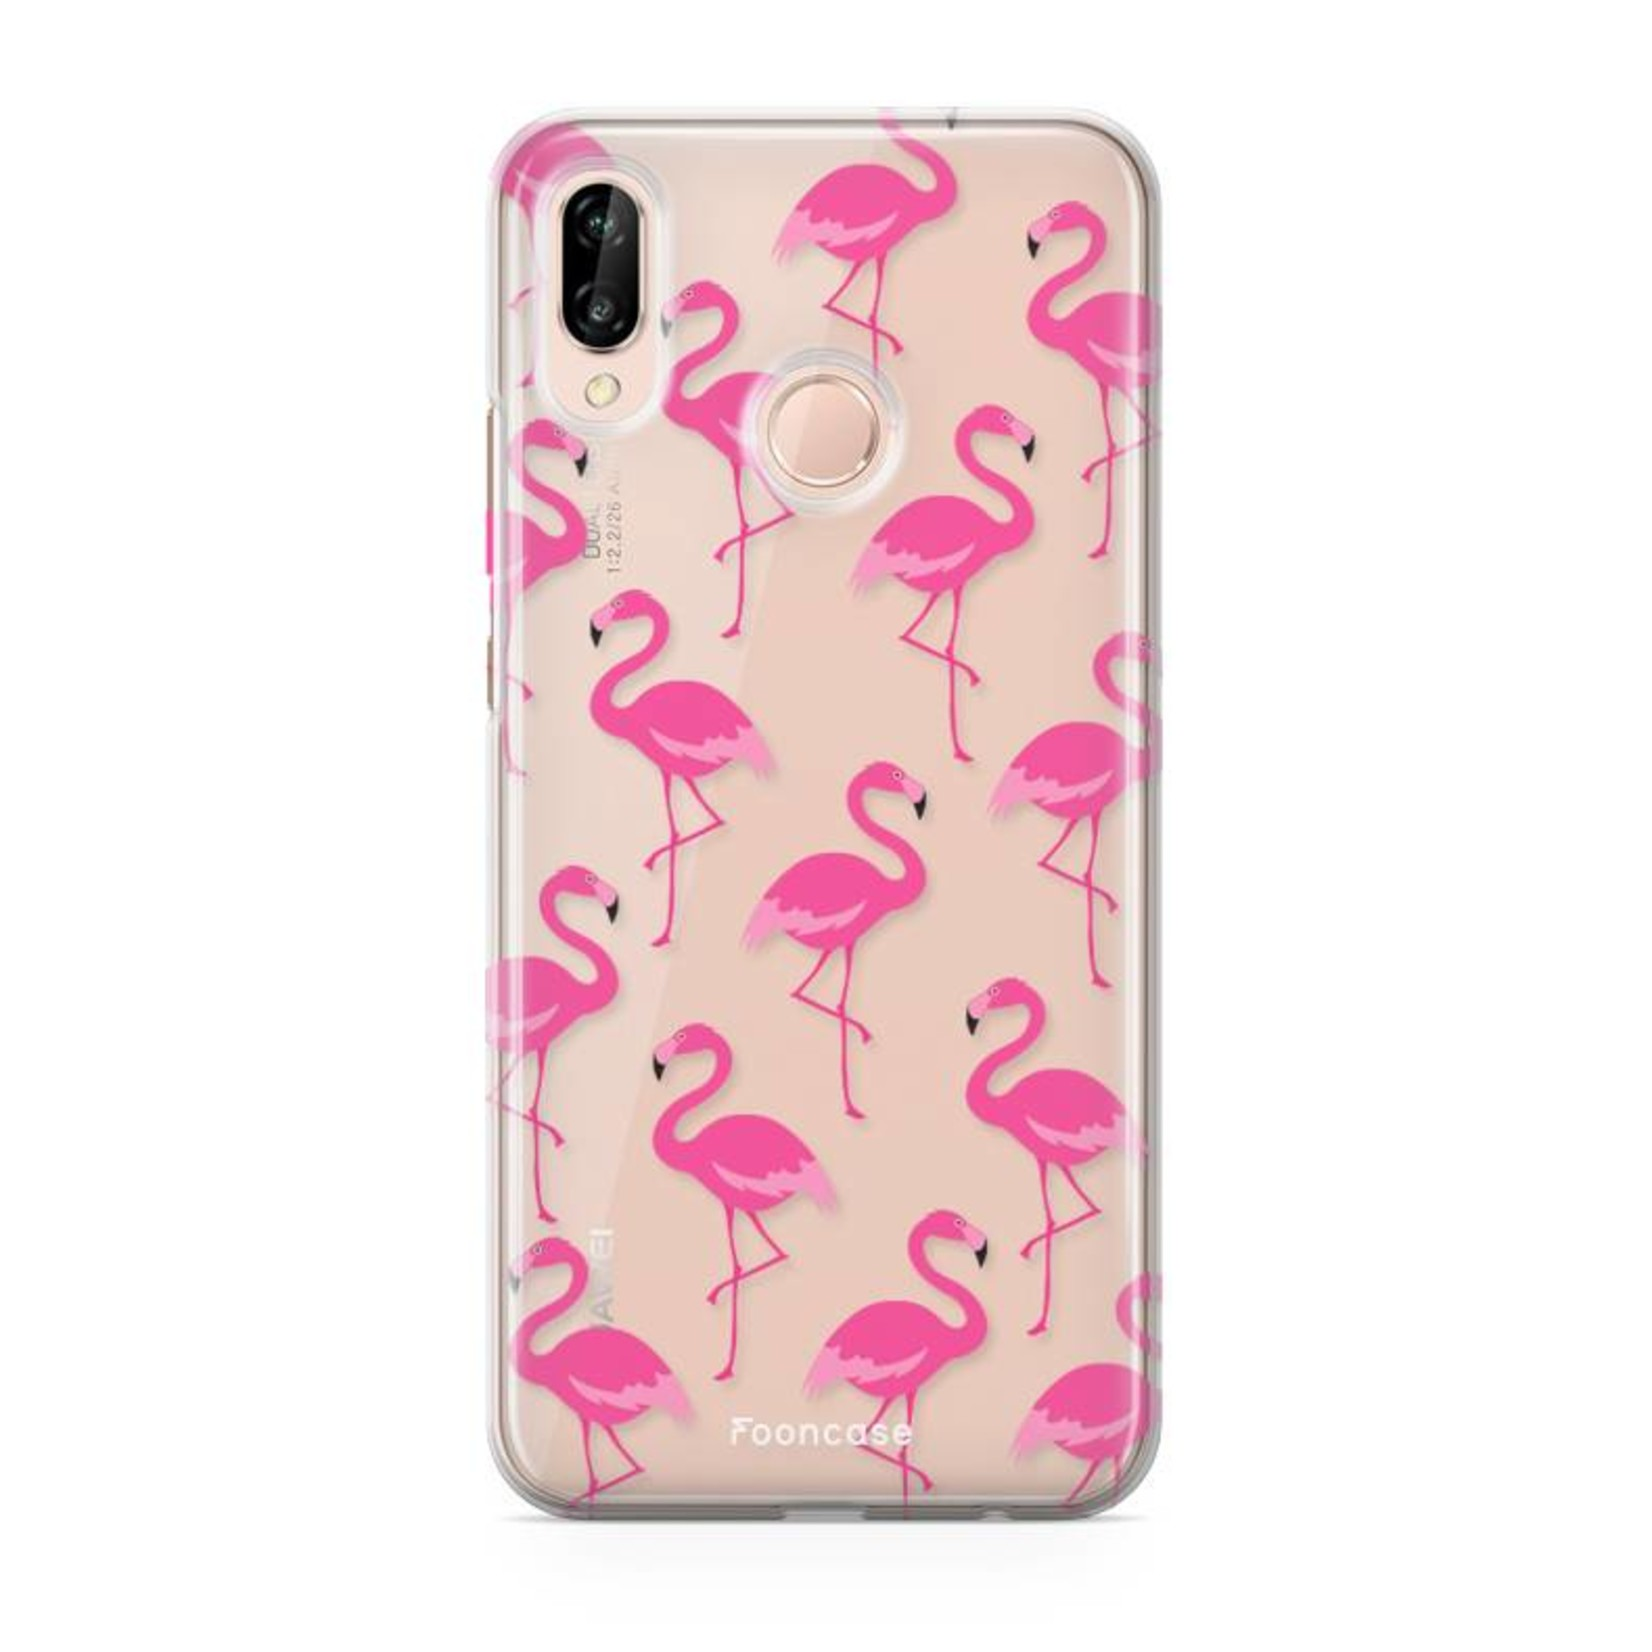 FOONCASE Huawei P20 Lite hoesje TPU Soft Case - Back Cover - Flamingo